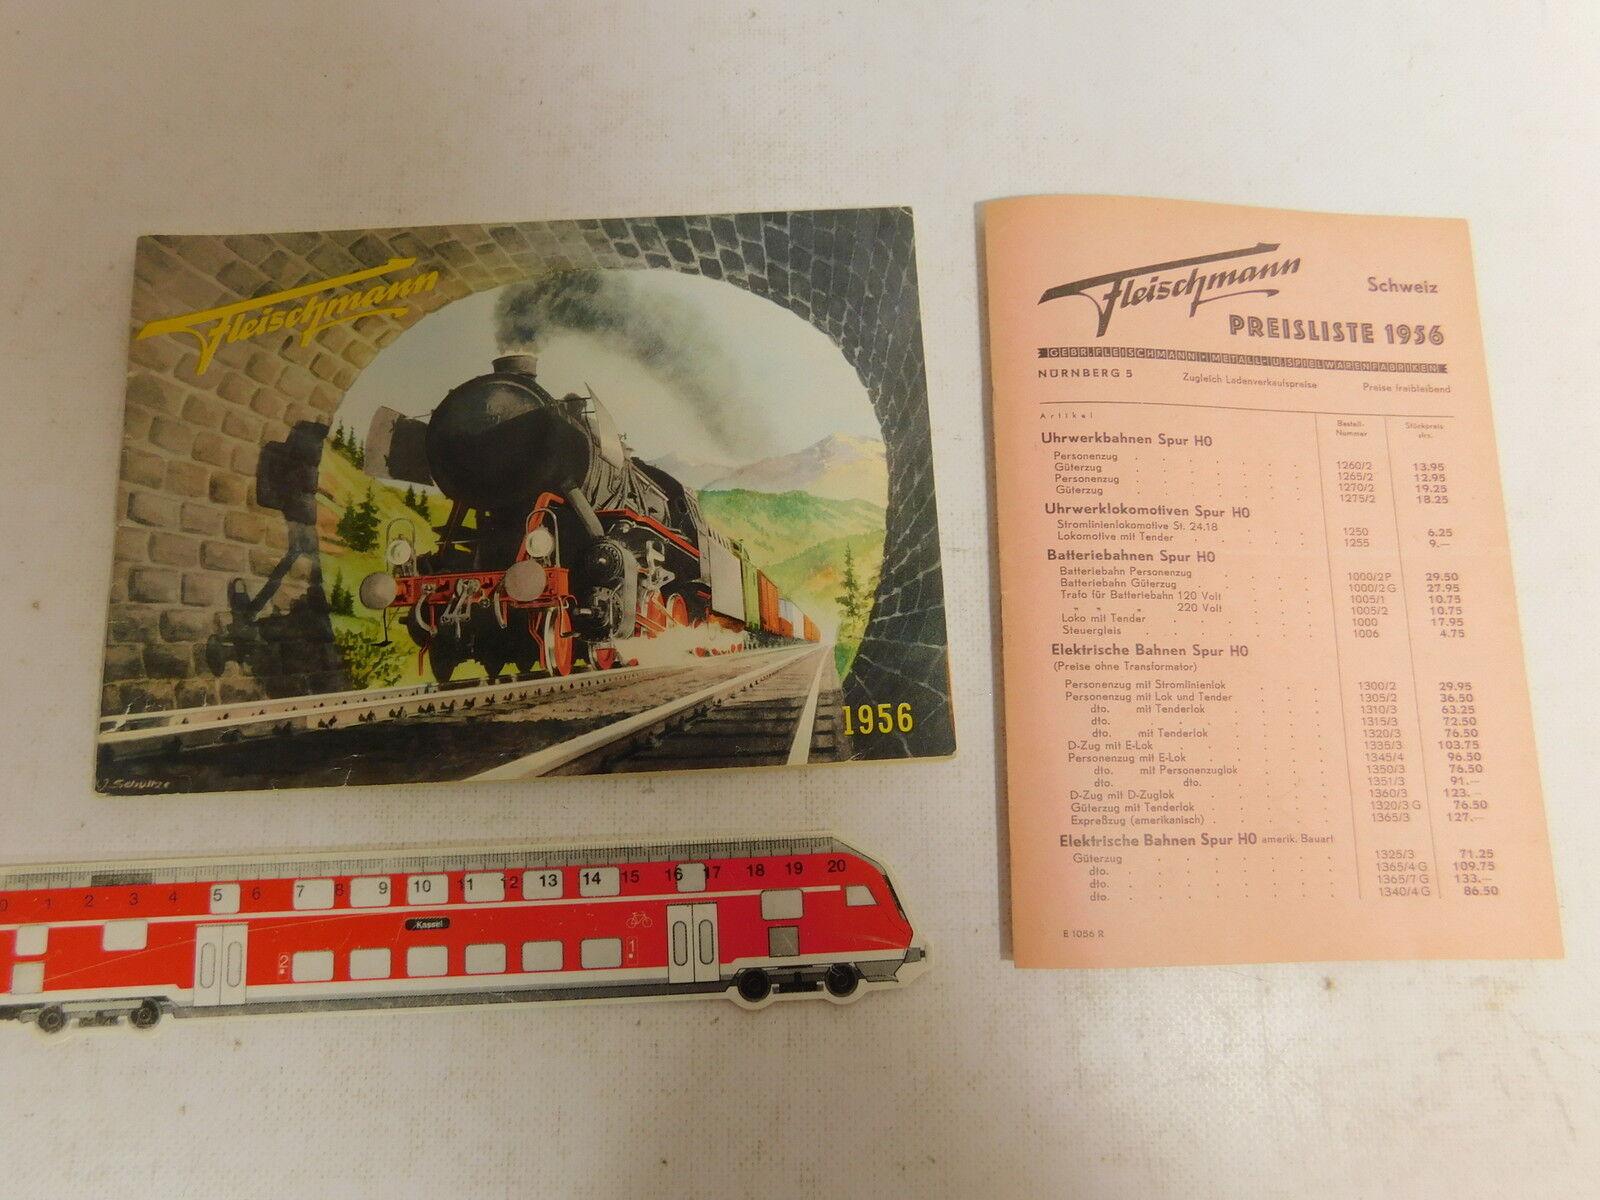 AS409-0,5   Fleischmann H0 Catalogo 1956 Svizzera/Franken con Listino Prezzi